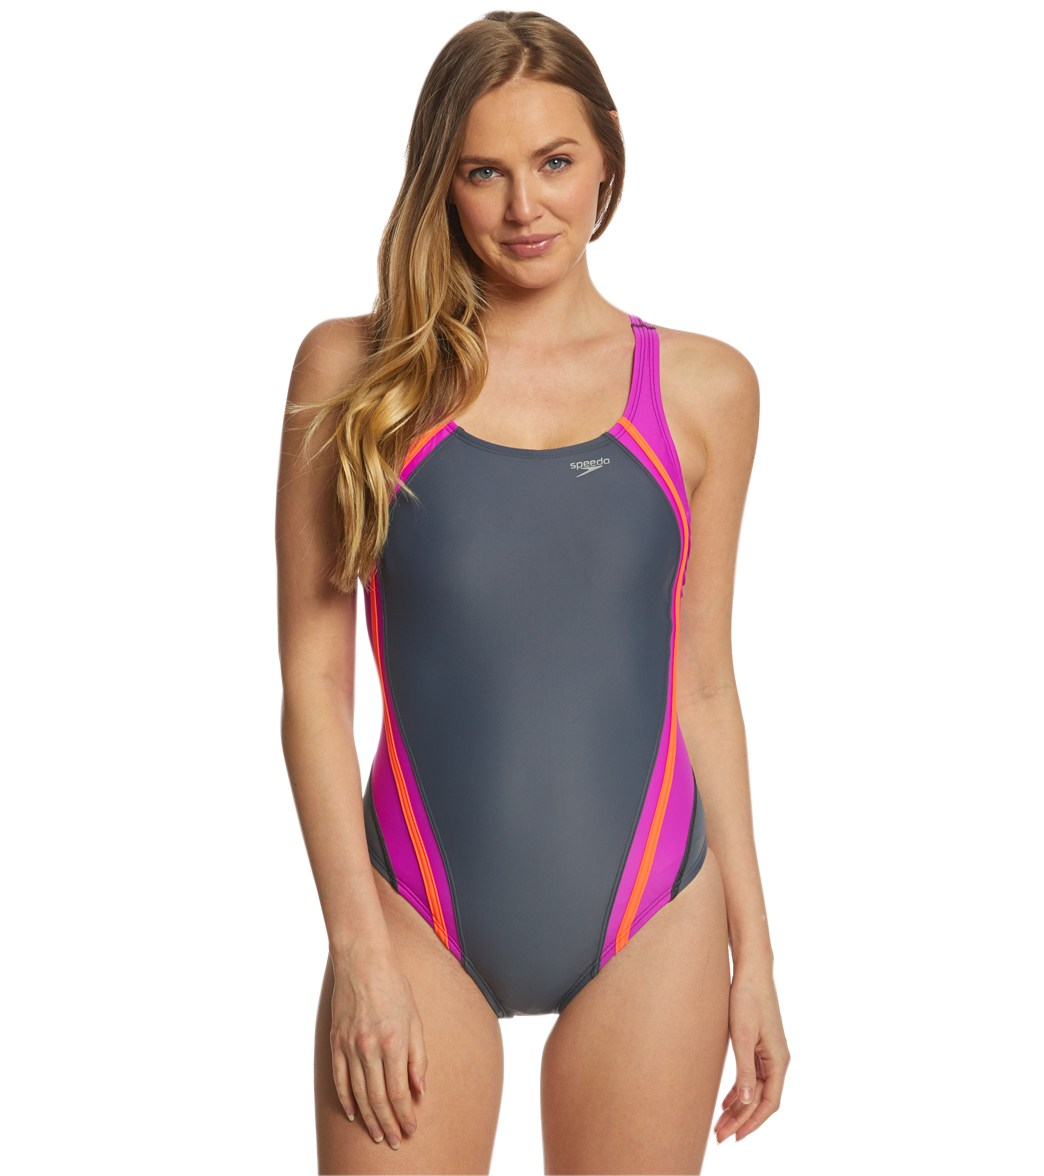 464543d50e9f3 Speedo Women's Quantum Splice One Piece Swimsuit at SwimOutlet.com - Free  Shipping